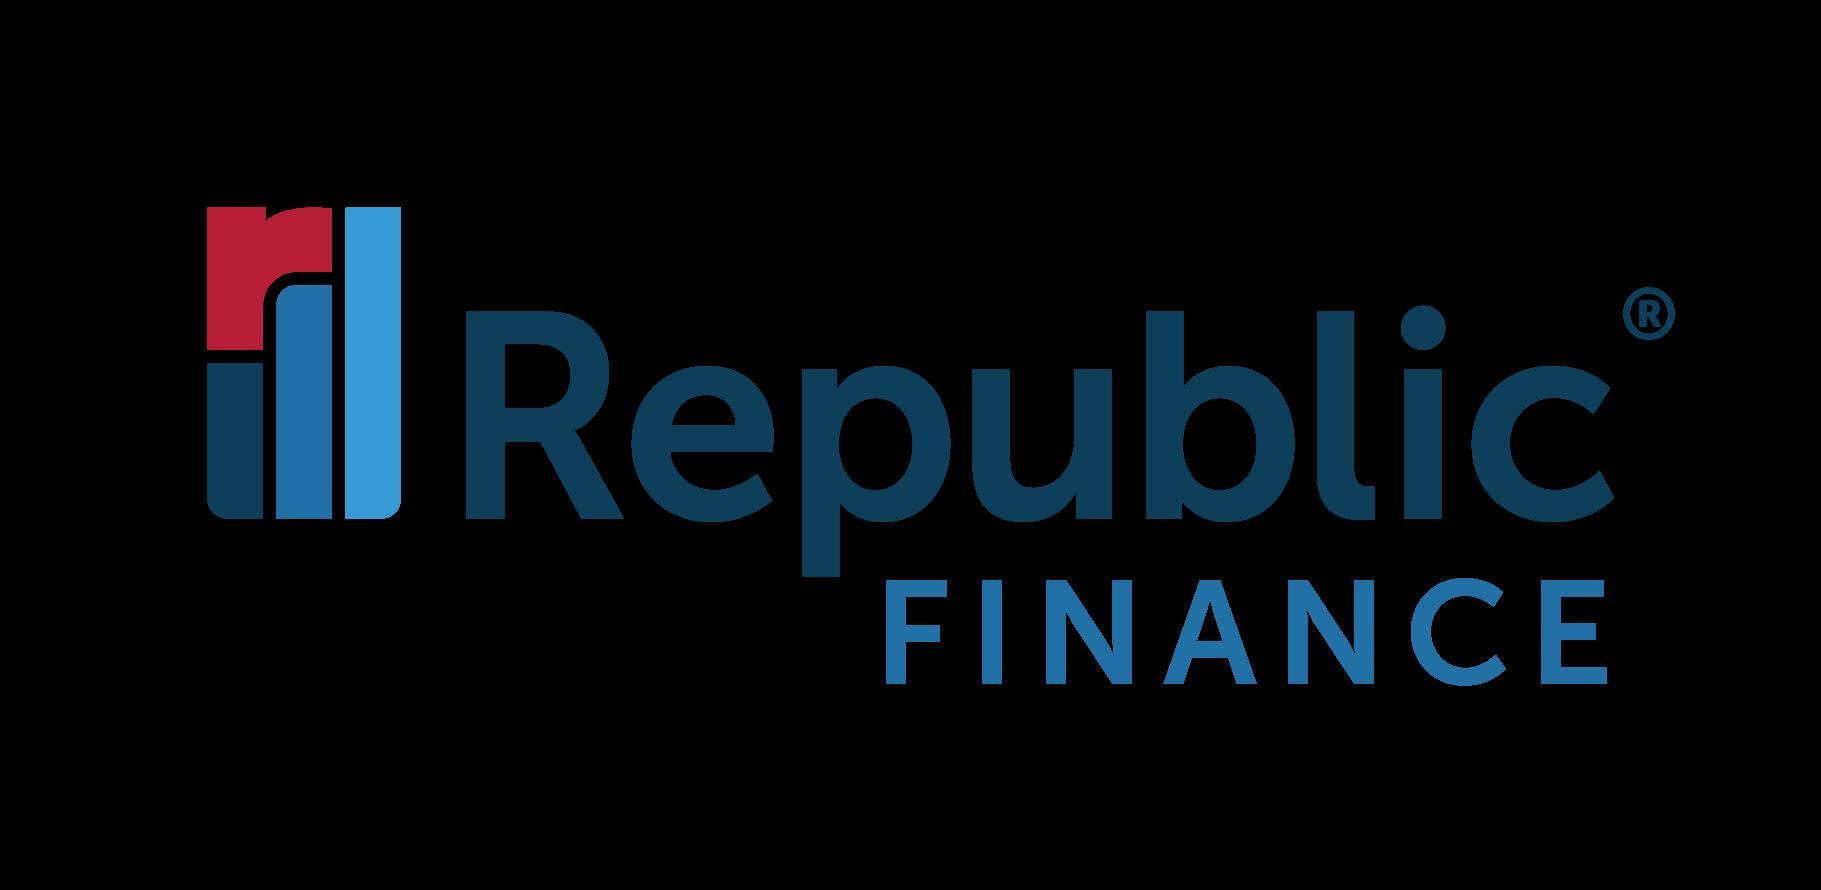 Republic Finance Chesterfield (636)735-3587